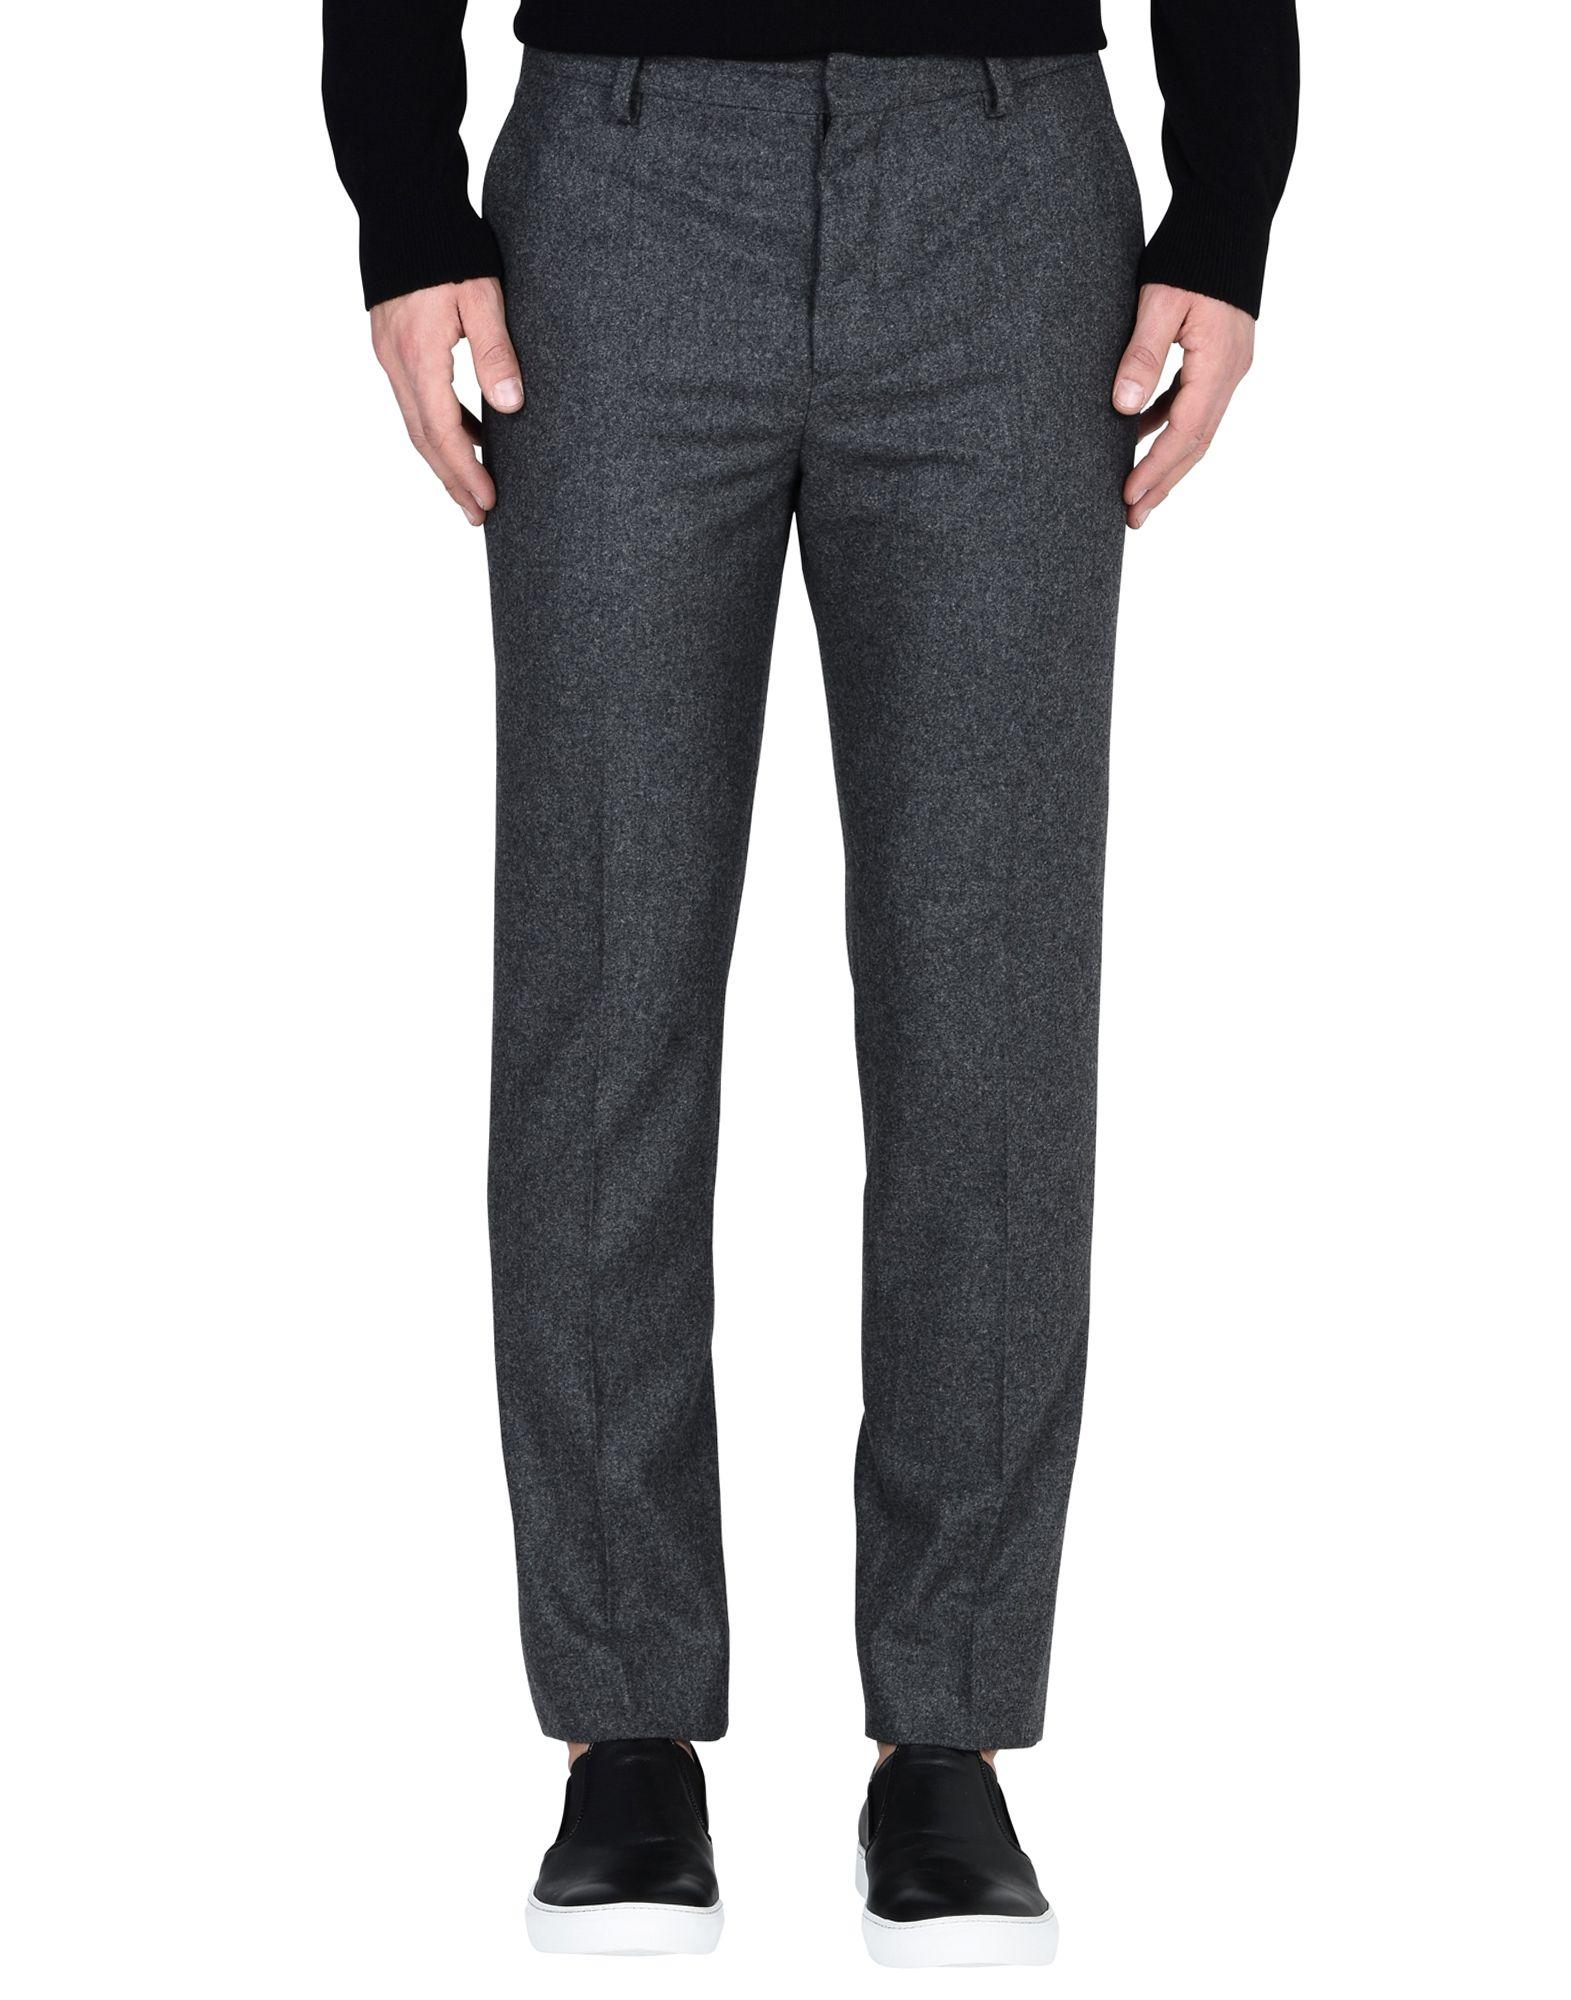 Pantalone Pantalone Harmony Paris uomo - 13117943FG  einzigartige Form